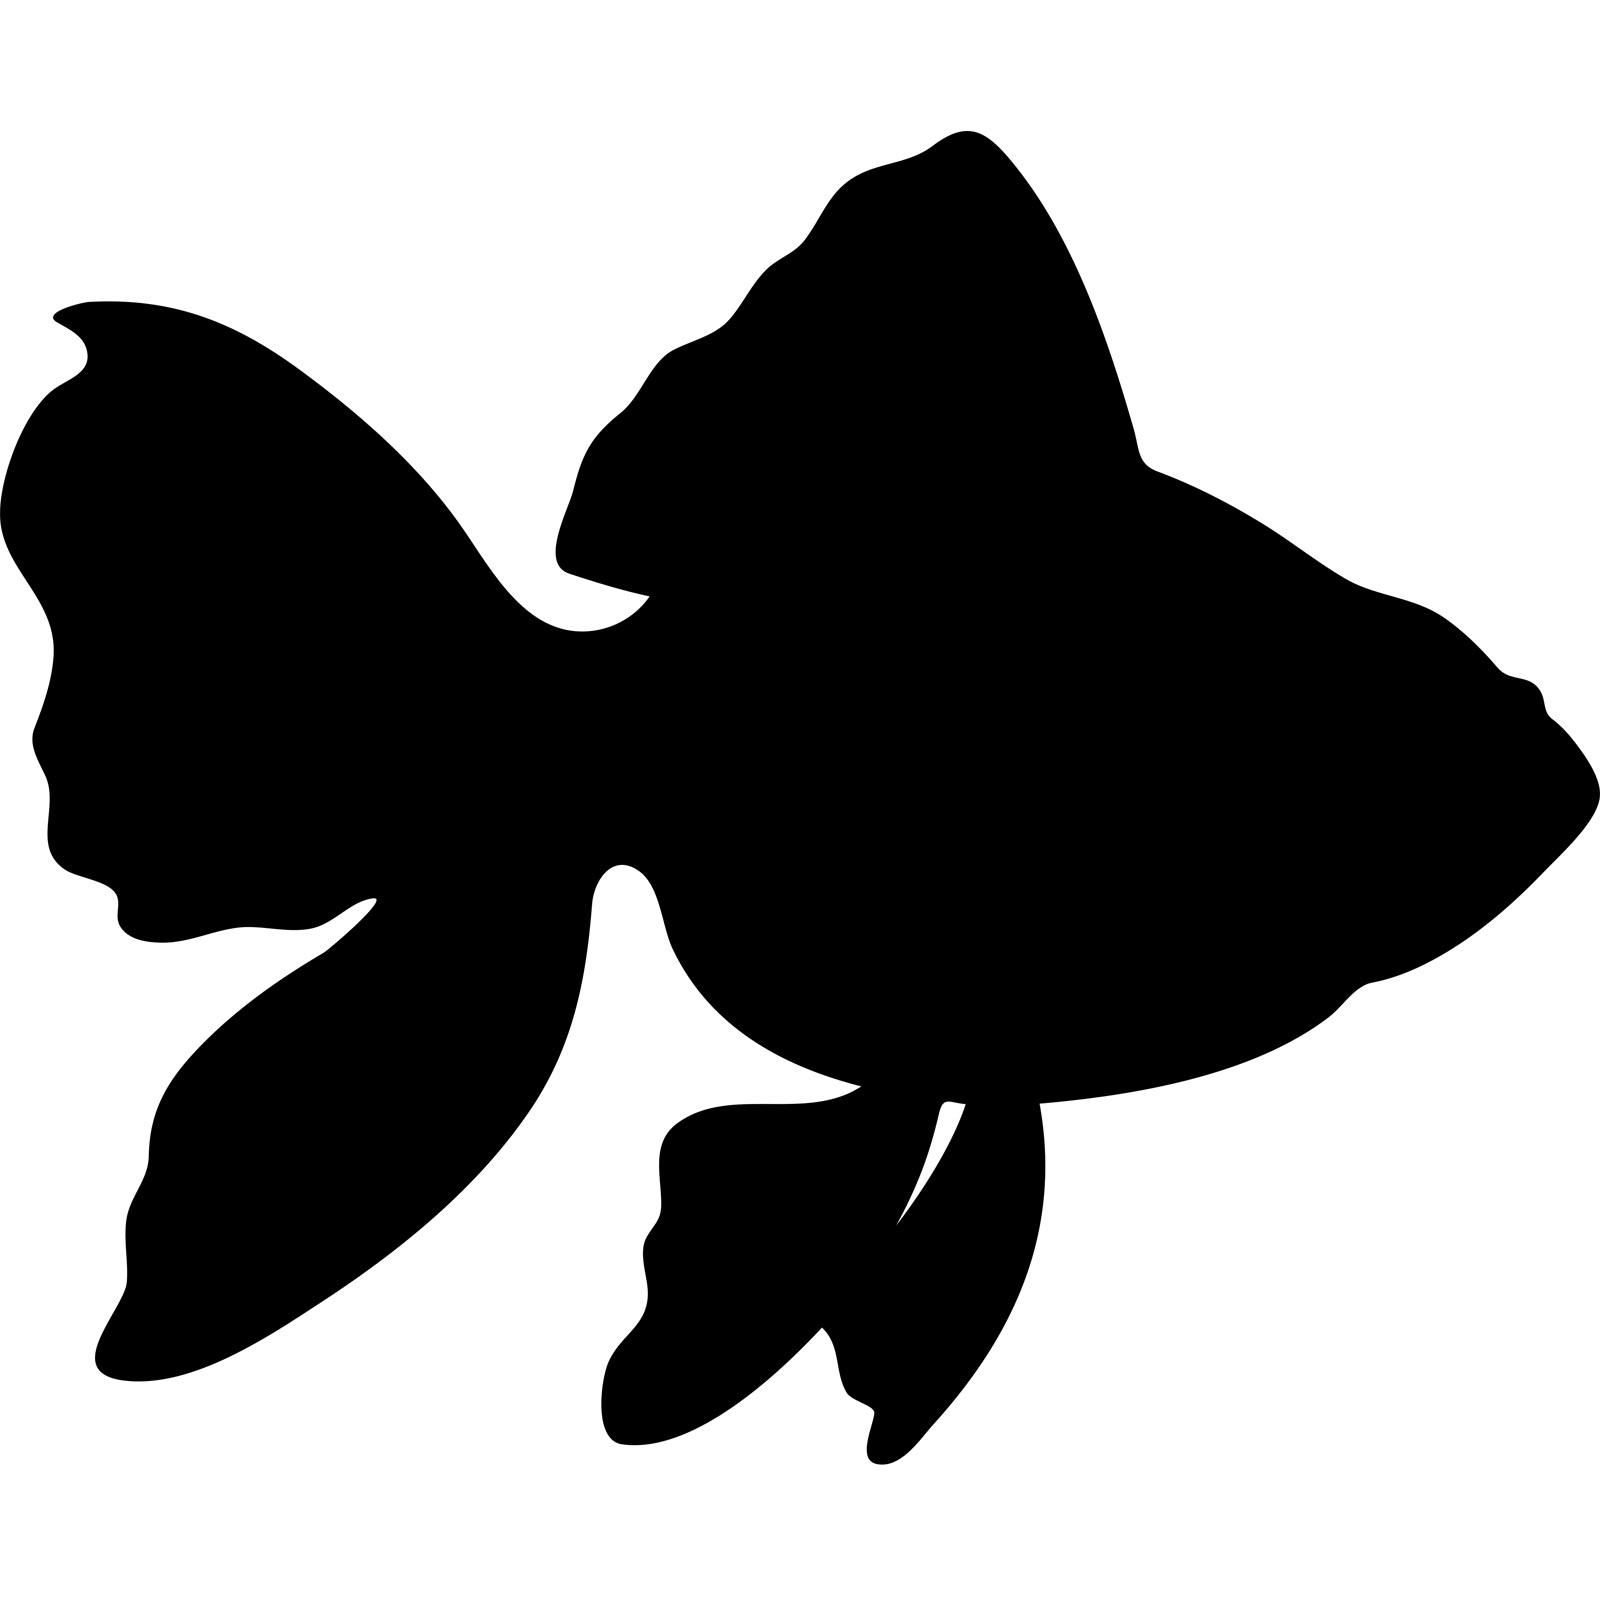 1600x1600 Fish Silhouette Clipart